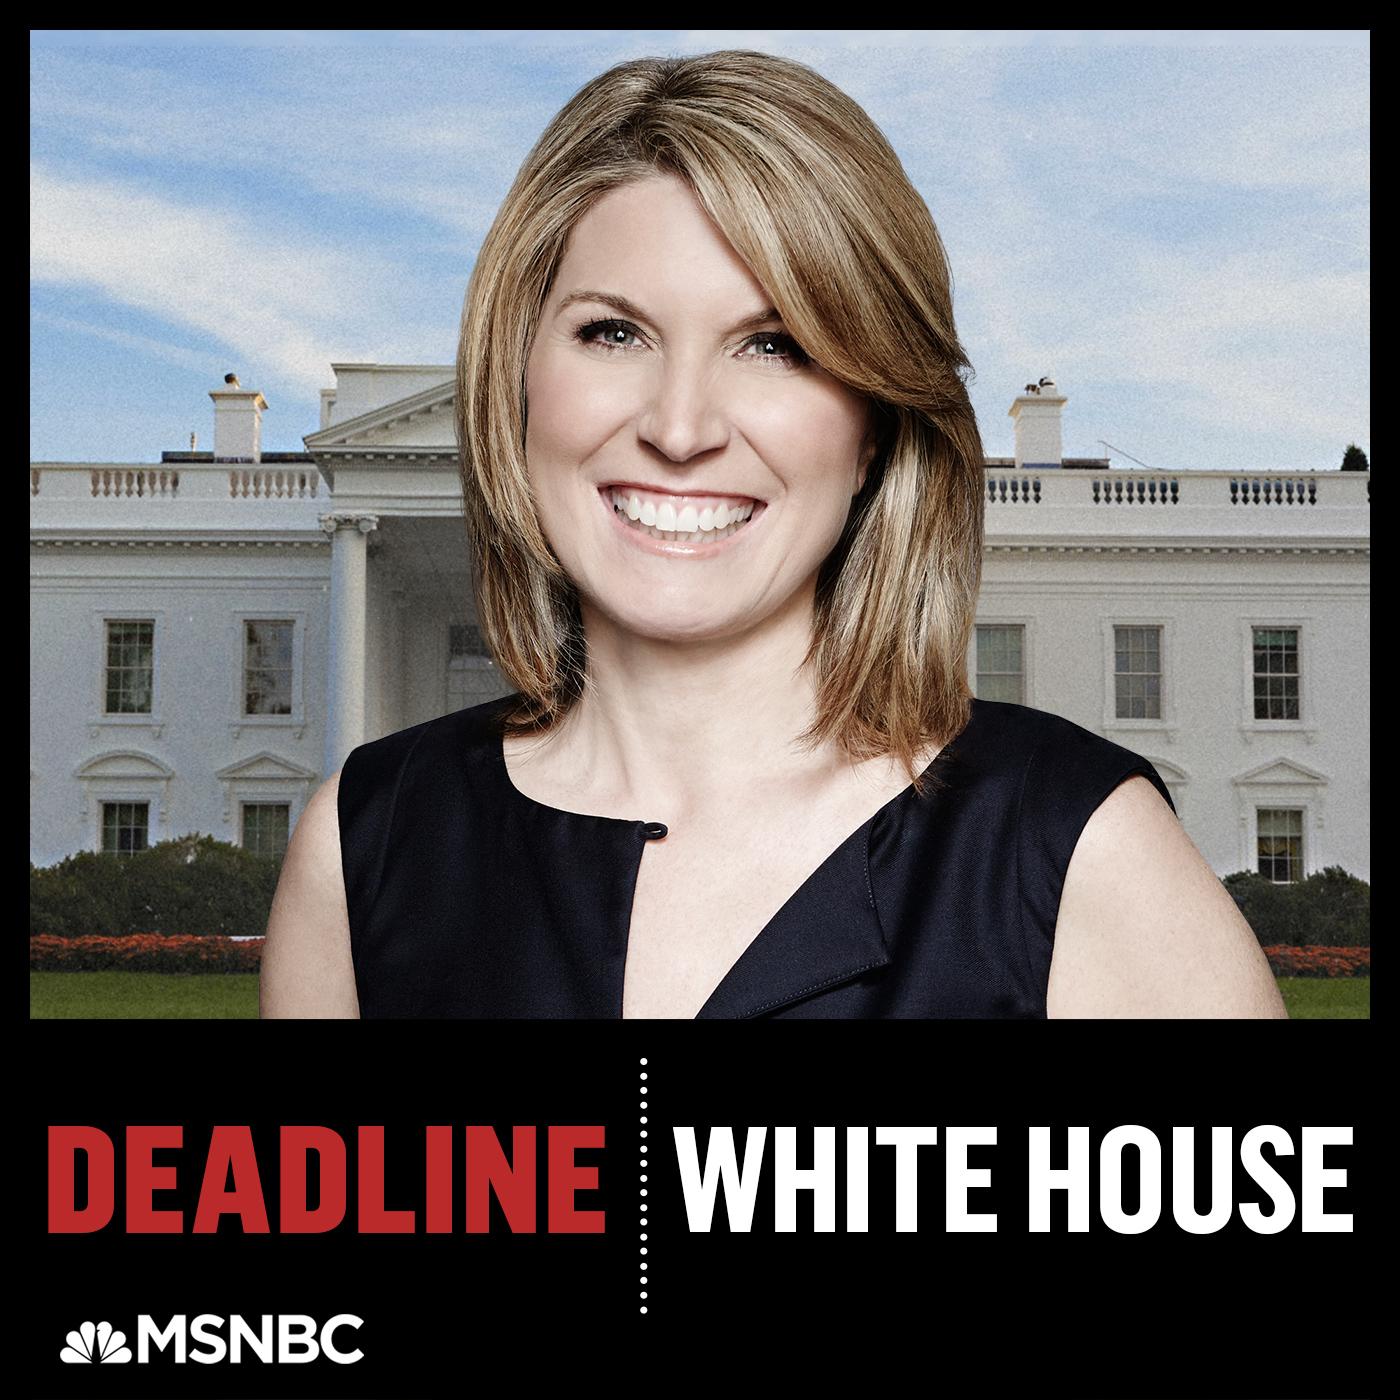 DeadlineWhiteHouse.jpeg